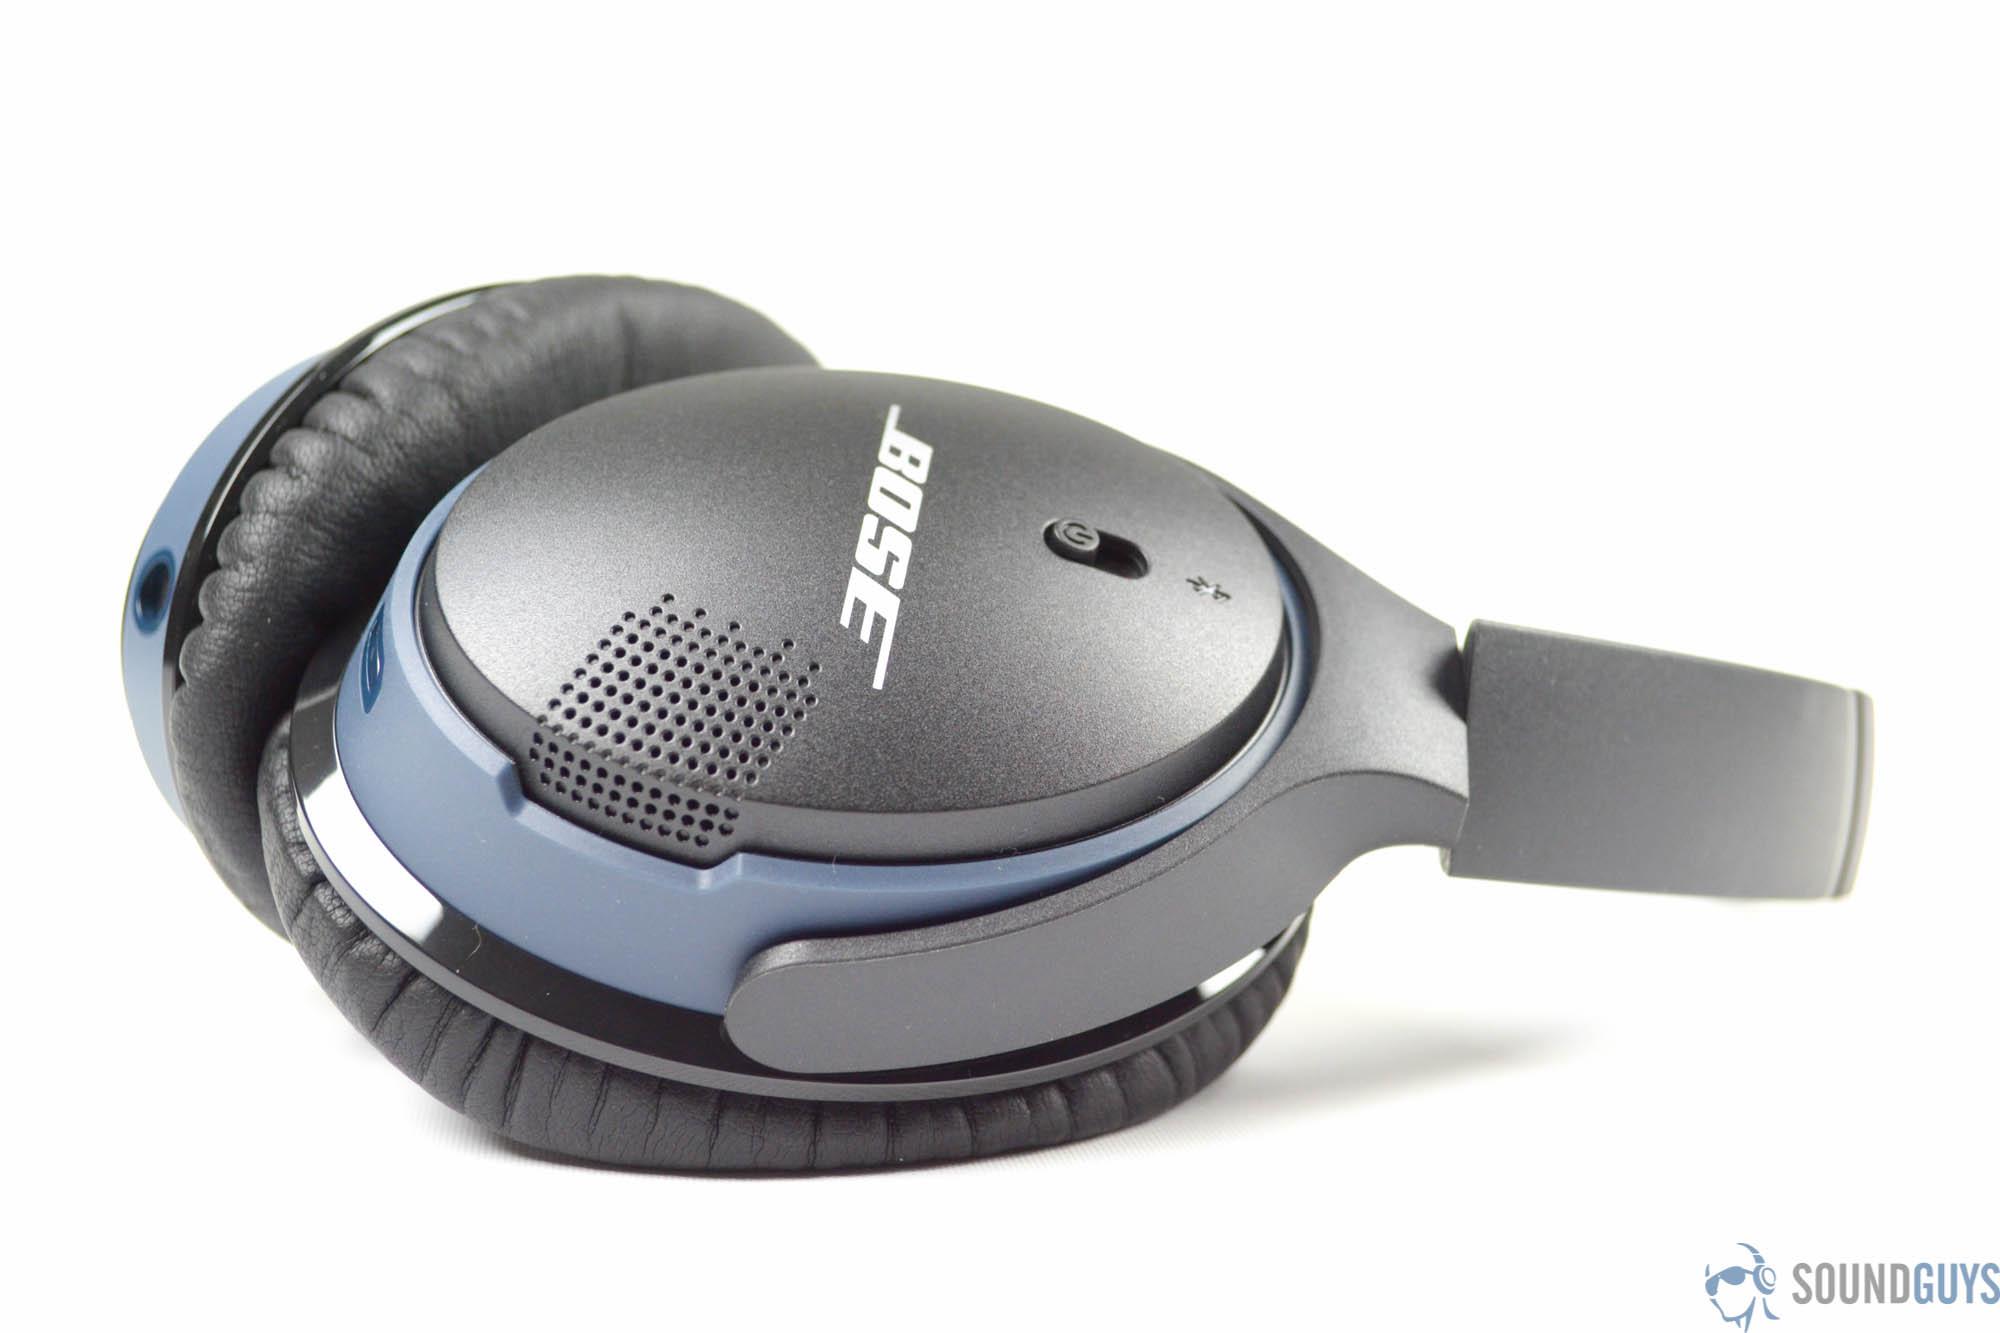 bose-soundlink-around-ear-wireless-headphones-ii-sg-2